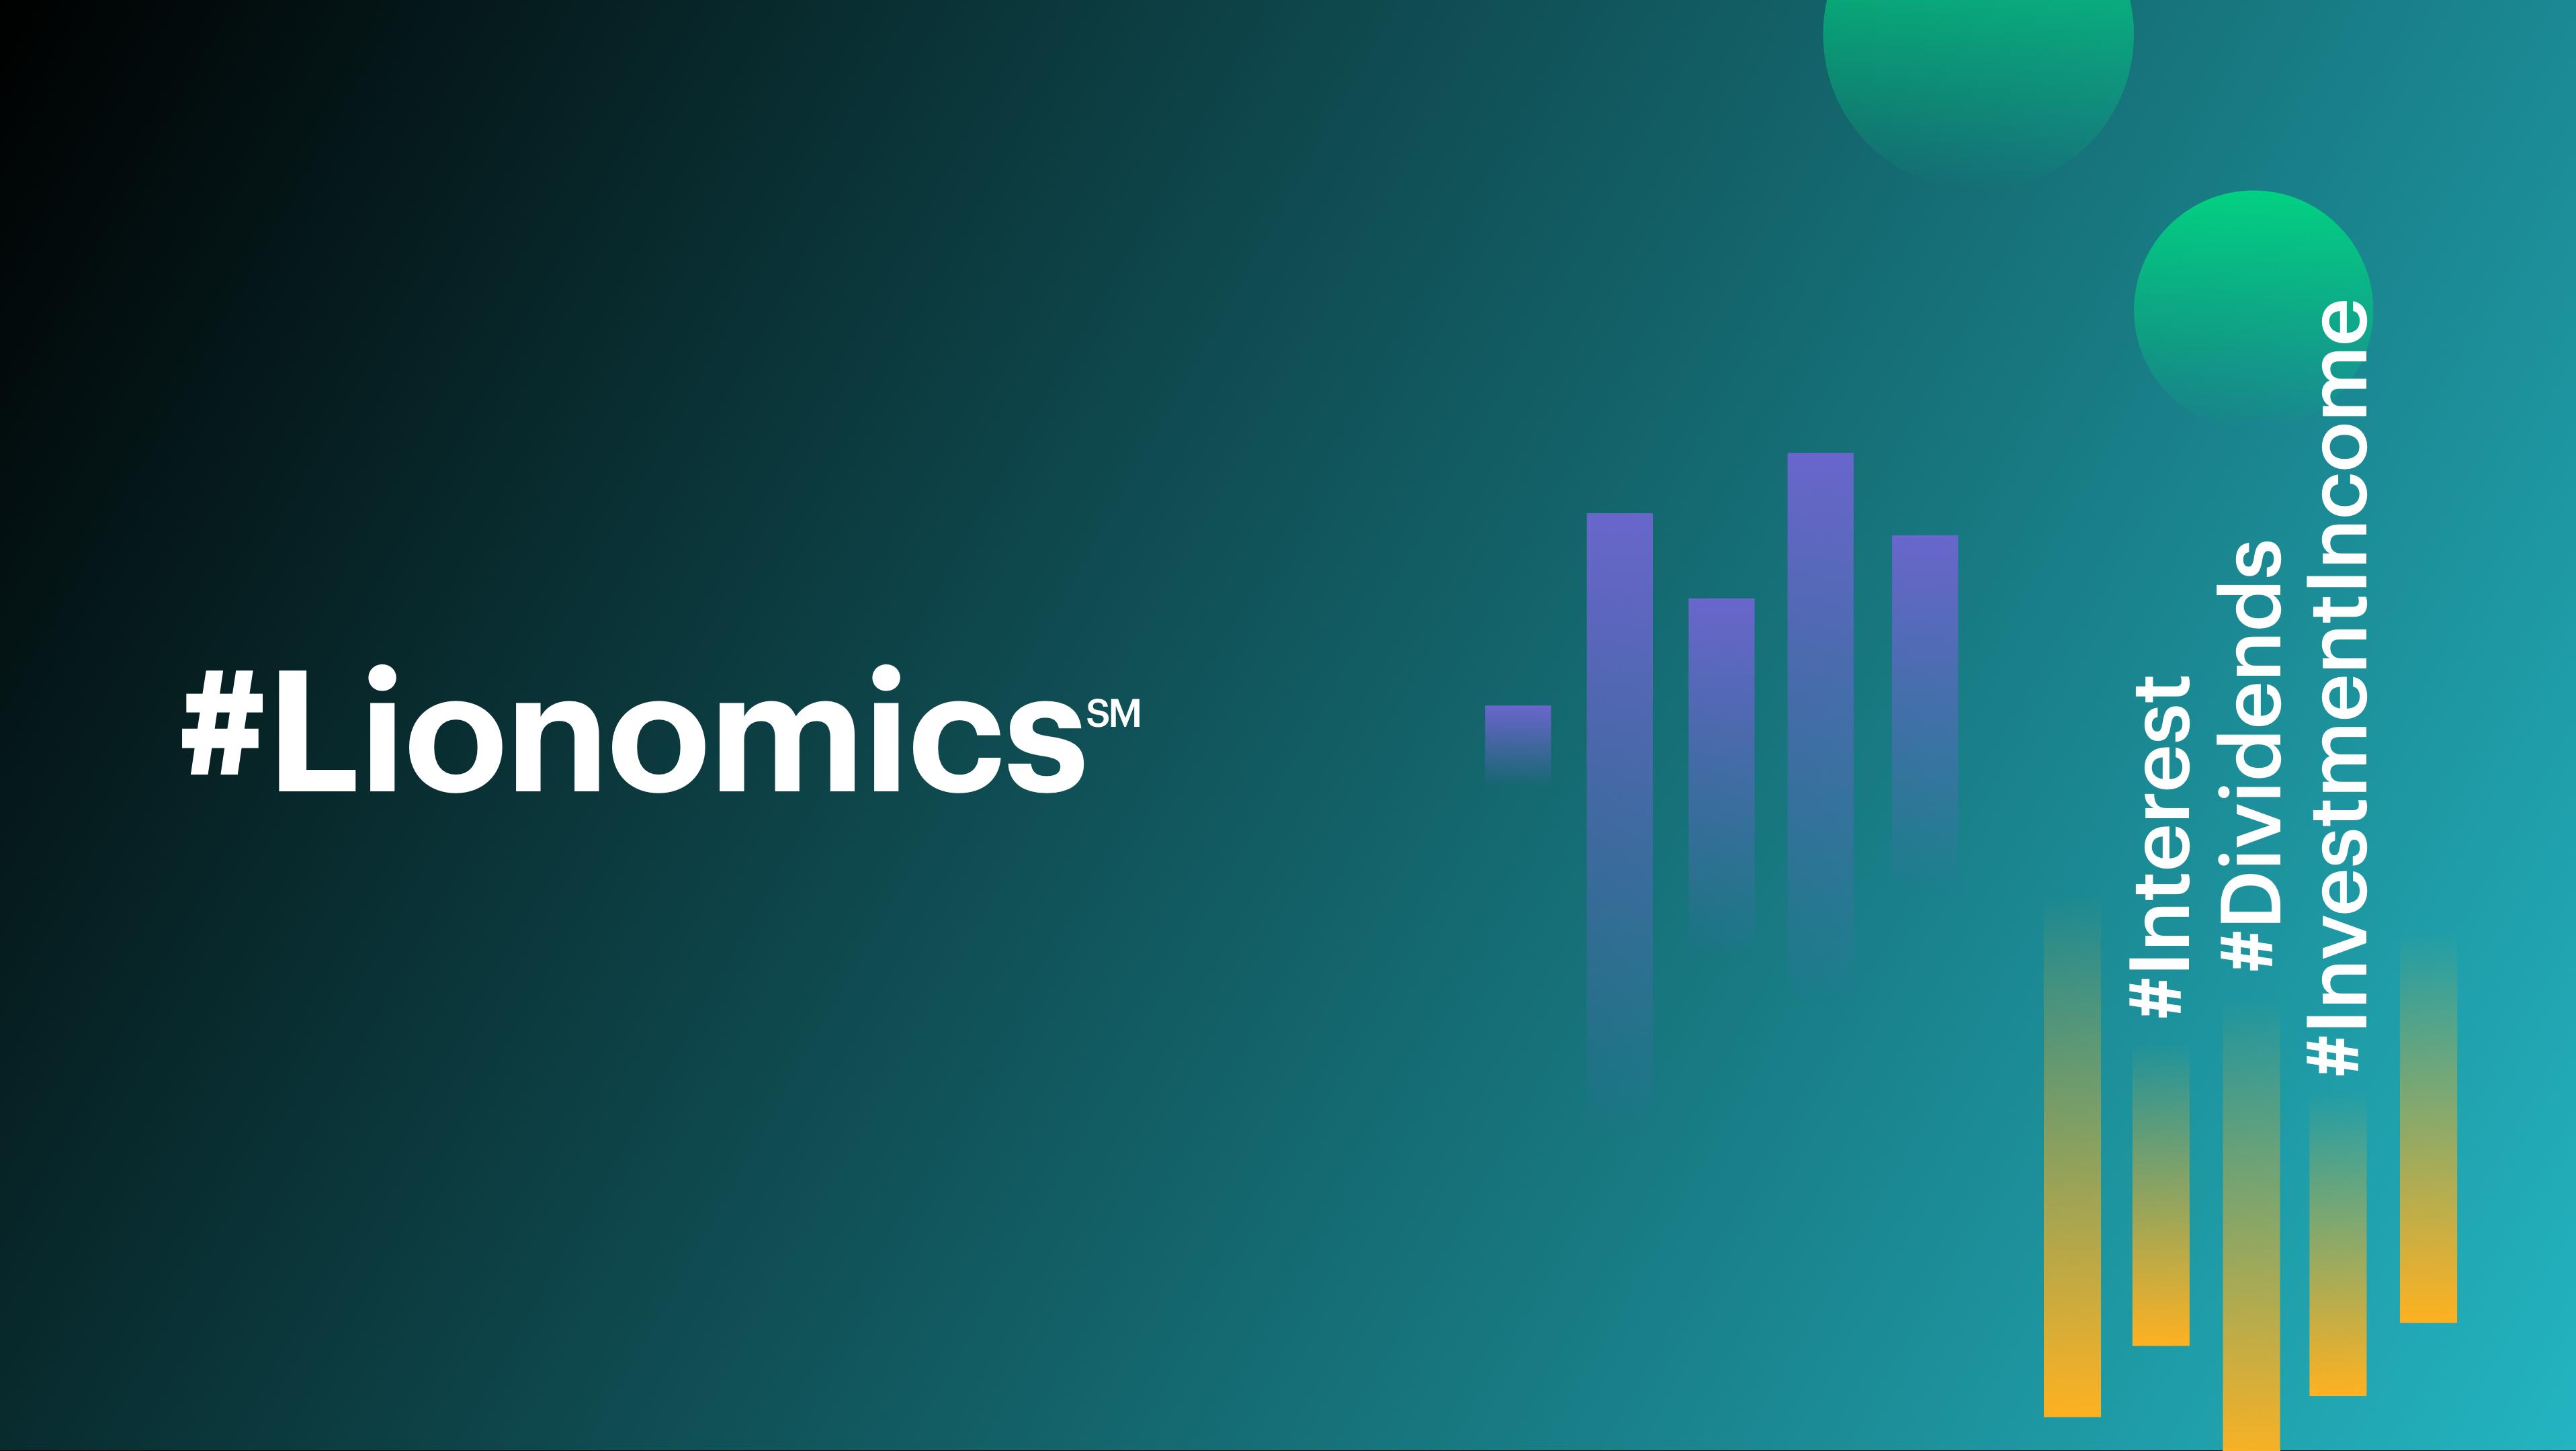 Lionomics 37 Blog Income 10302018